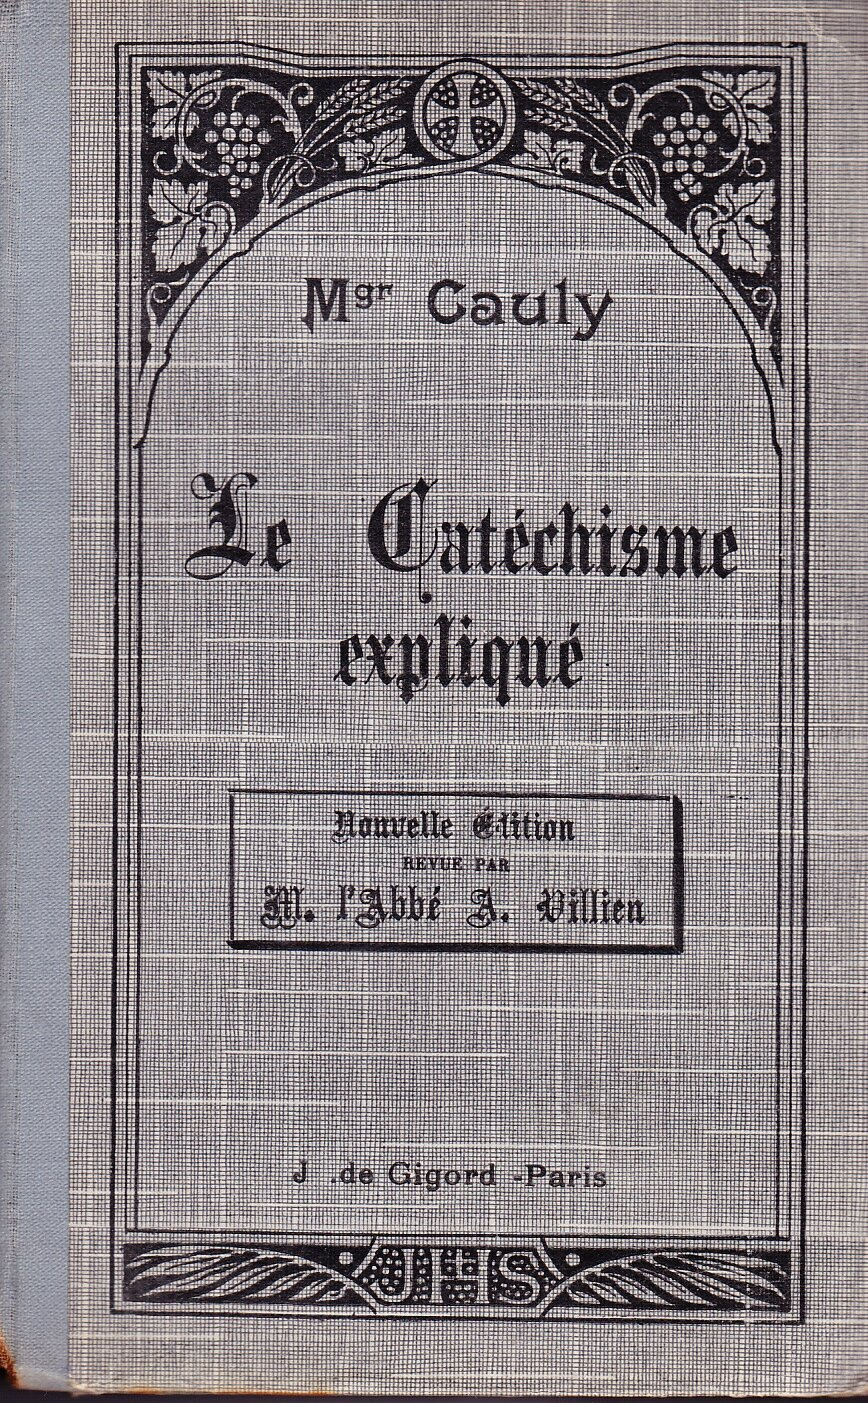 Cauly-